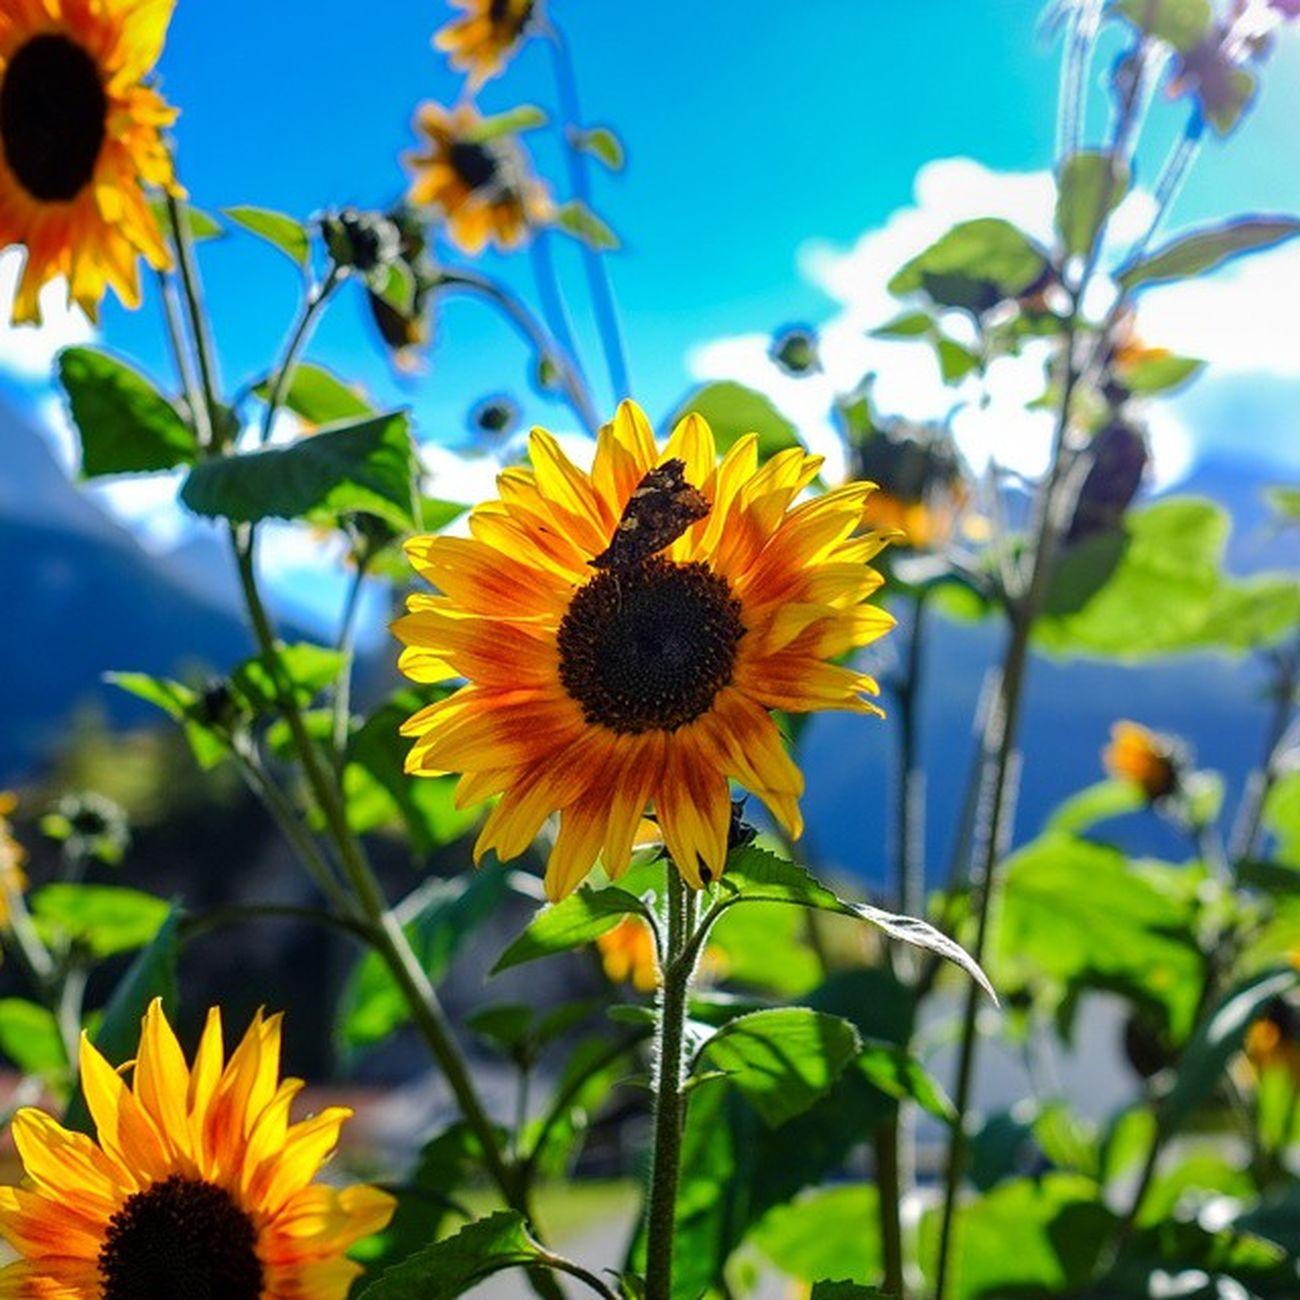 Fuji Xtrans Photo X -e1 Sunflower Bluesky Awsomeness Colors